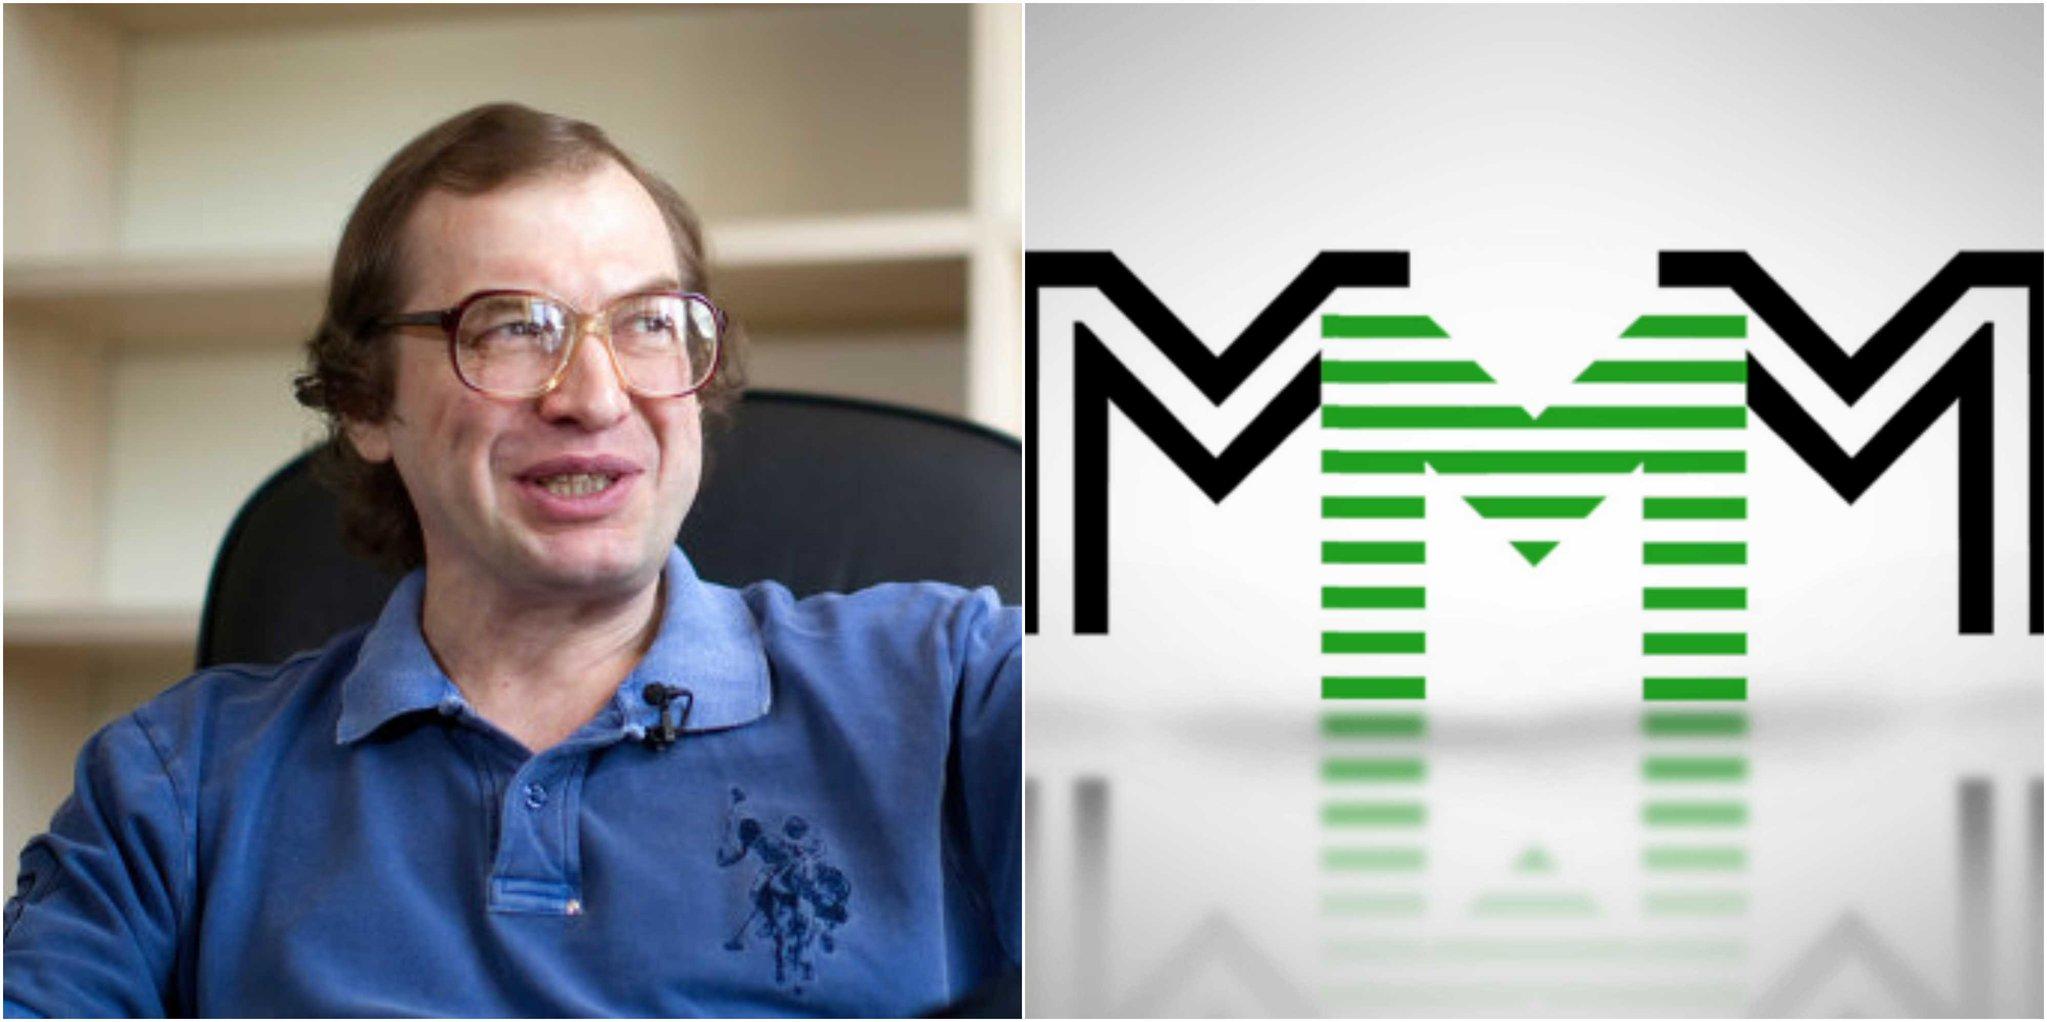 MMM Founder dies